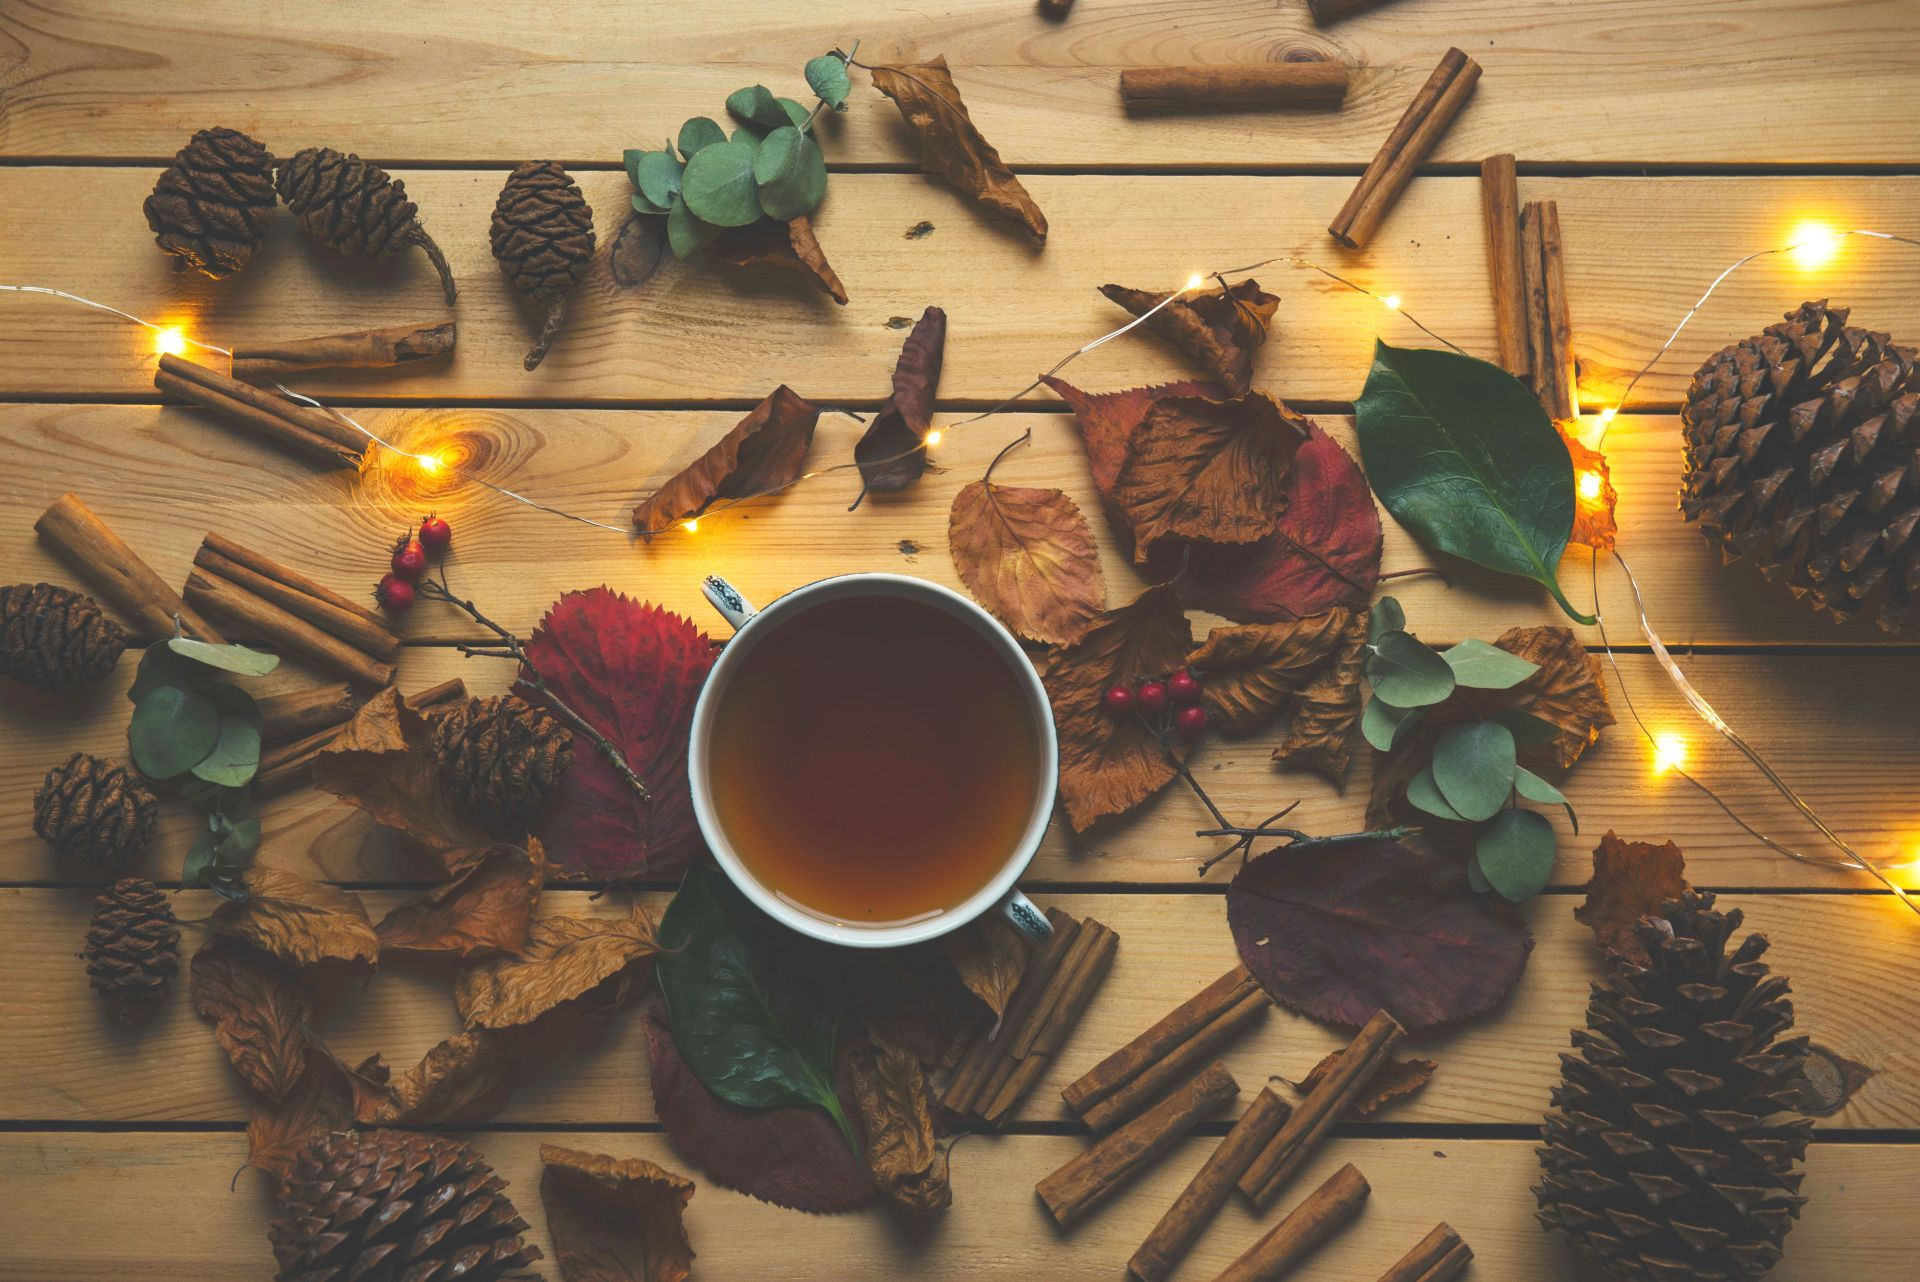 Hygge im Herbst: Naturmaterialien & Holz